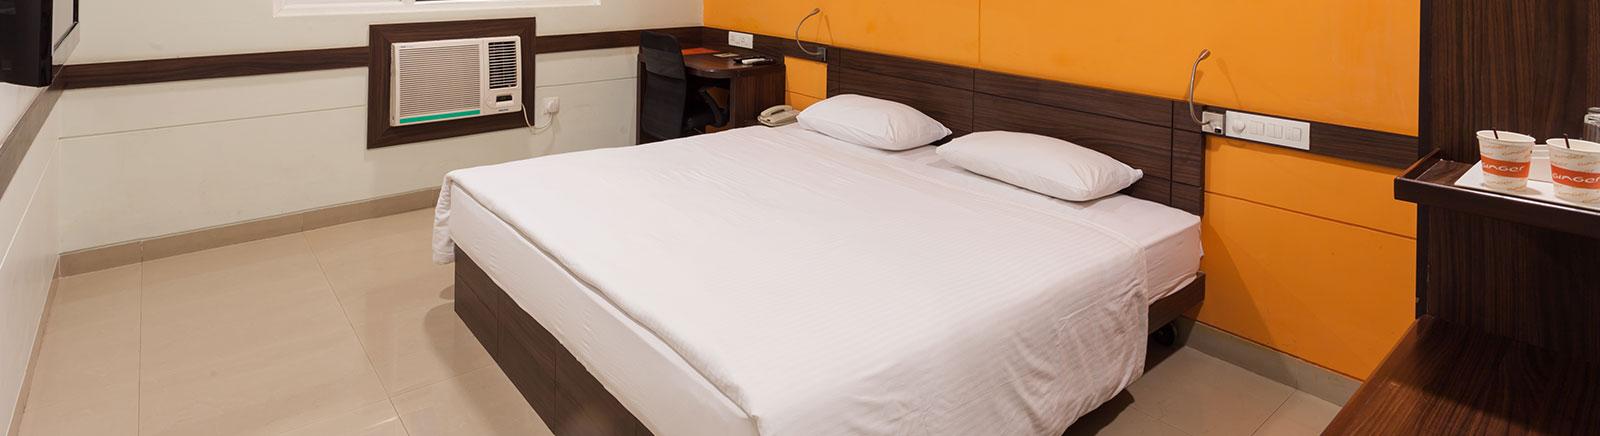 Ginger Jaipur Hotel Rooms